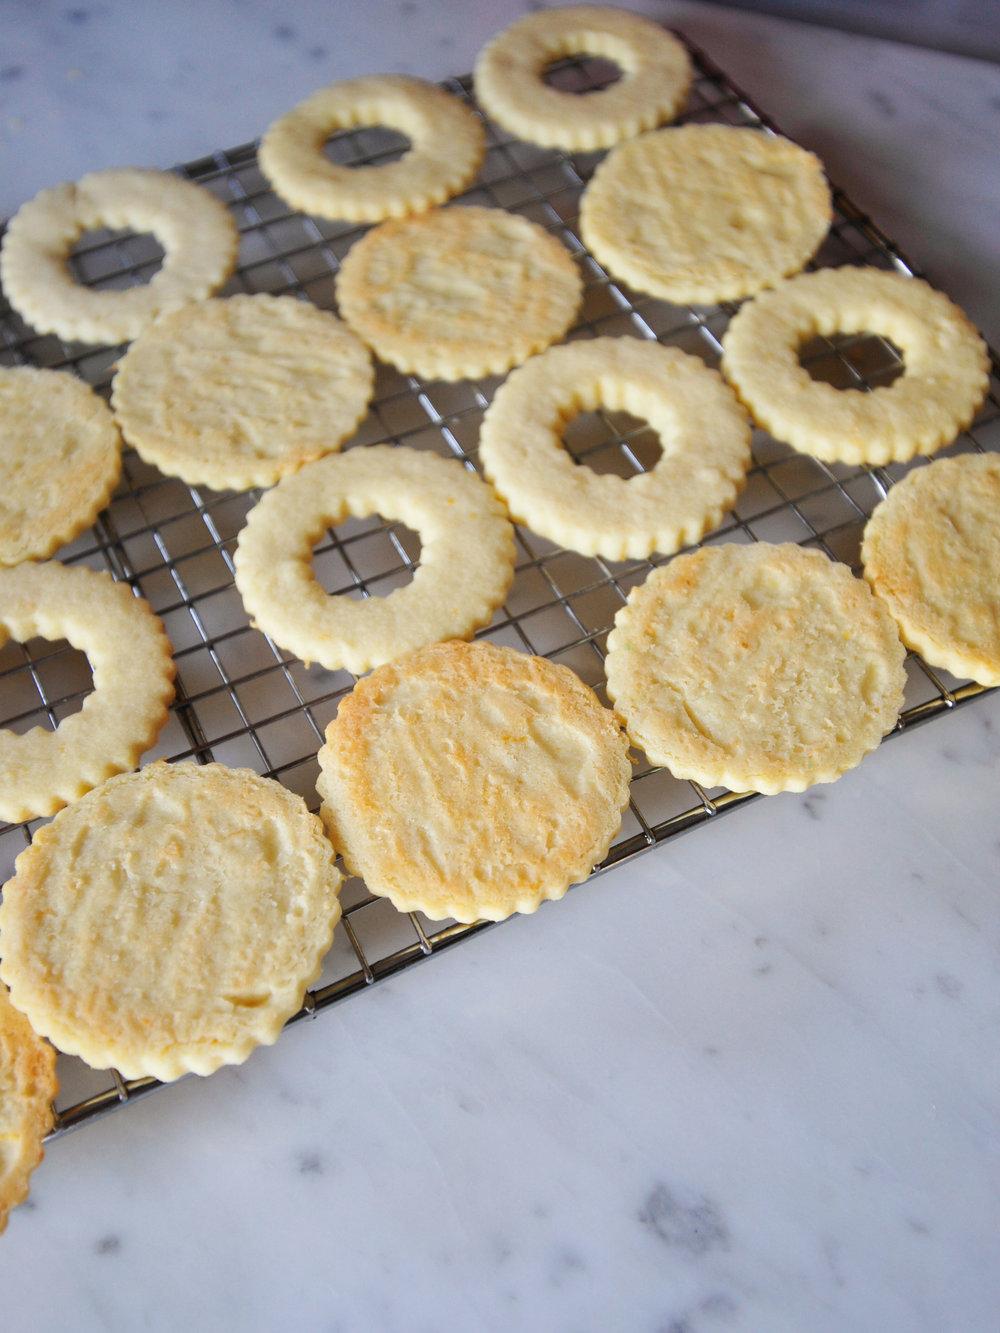 bowtiebaking-pineapple-yuzu-linzer-cookies-2